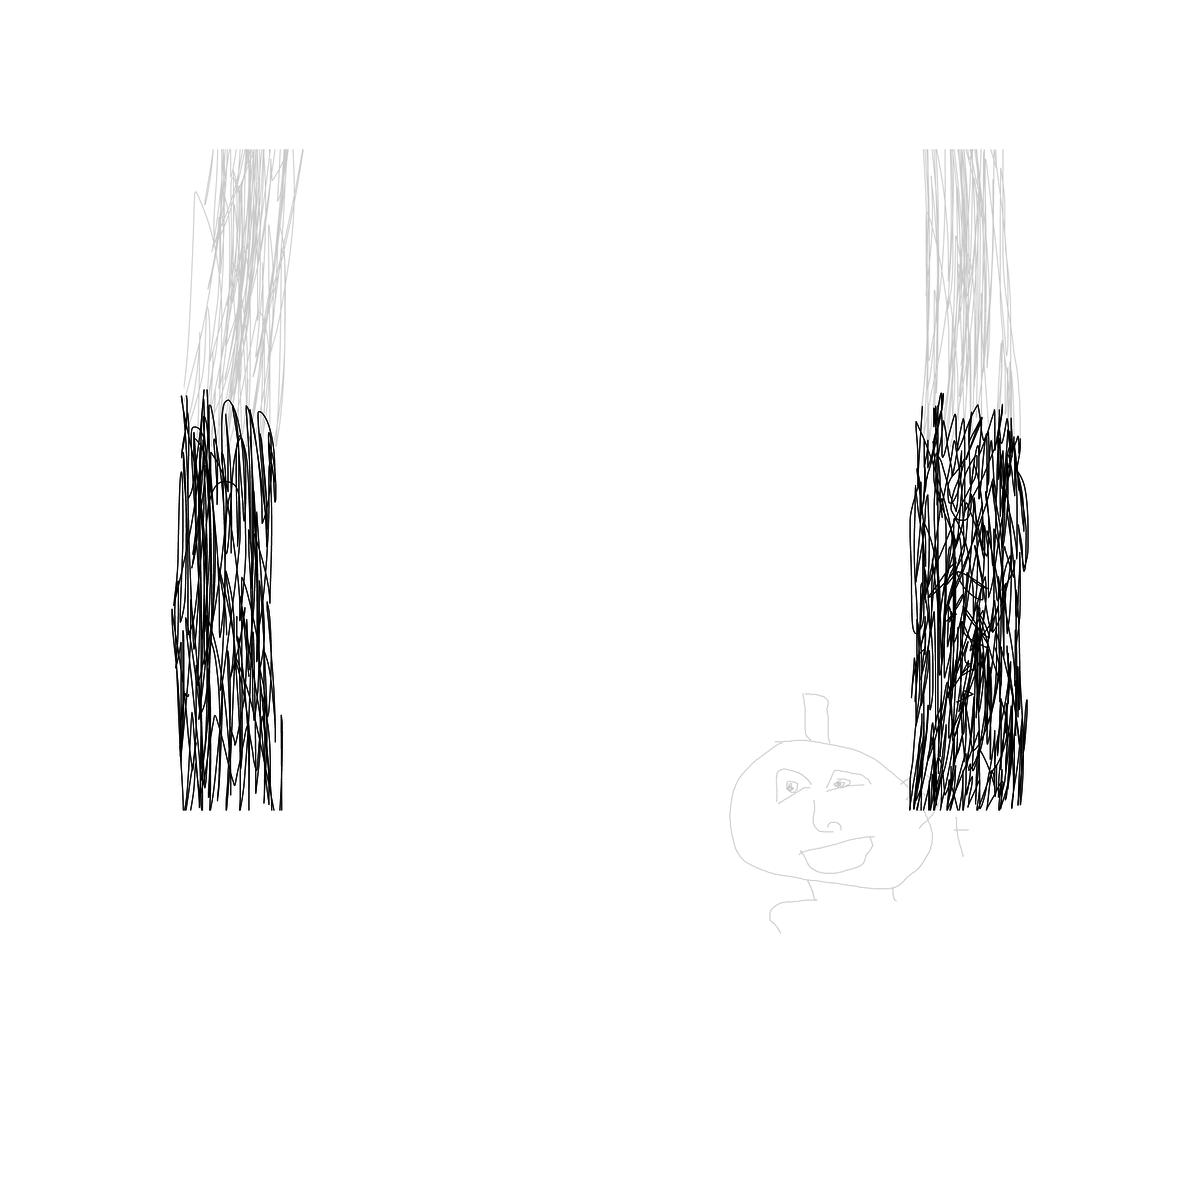 BAAAM drawing#23484 lat:52.4758148193359400lng: 13.4055576324462890